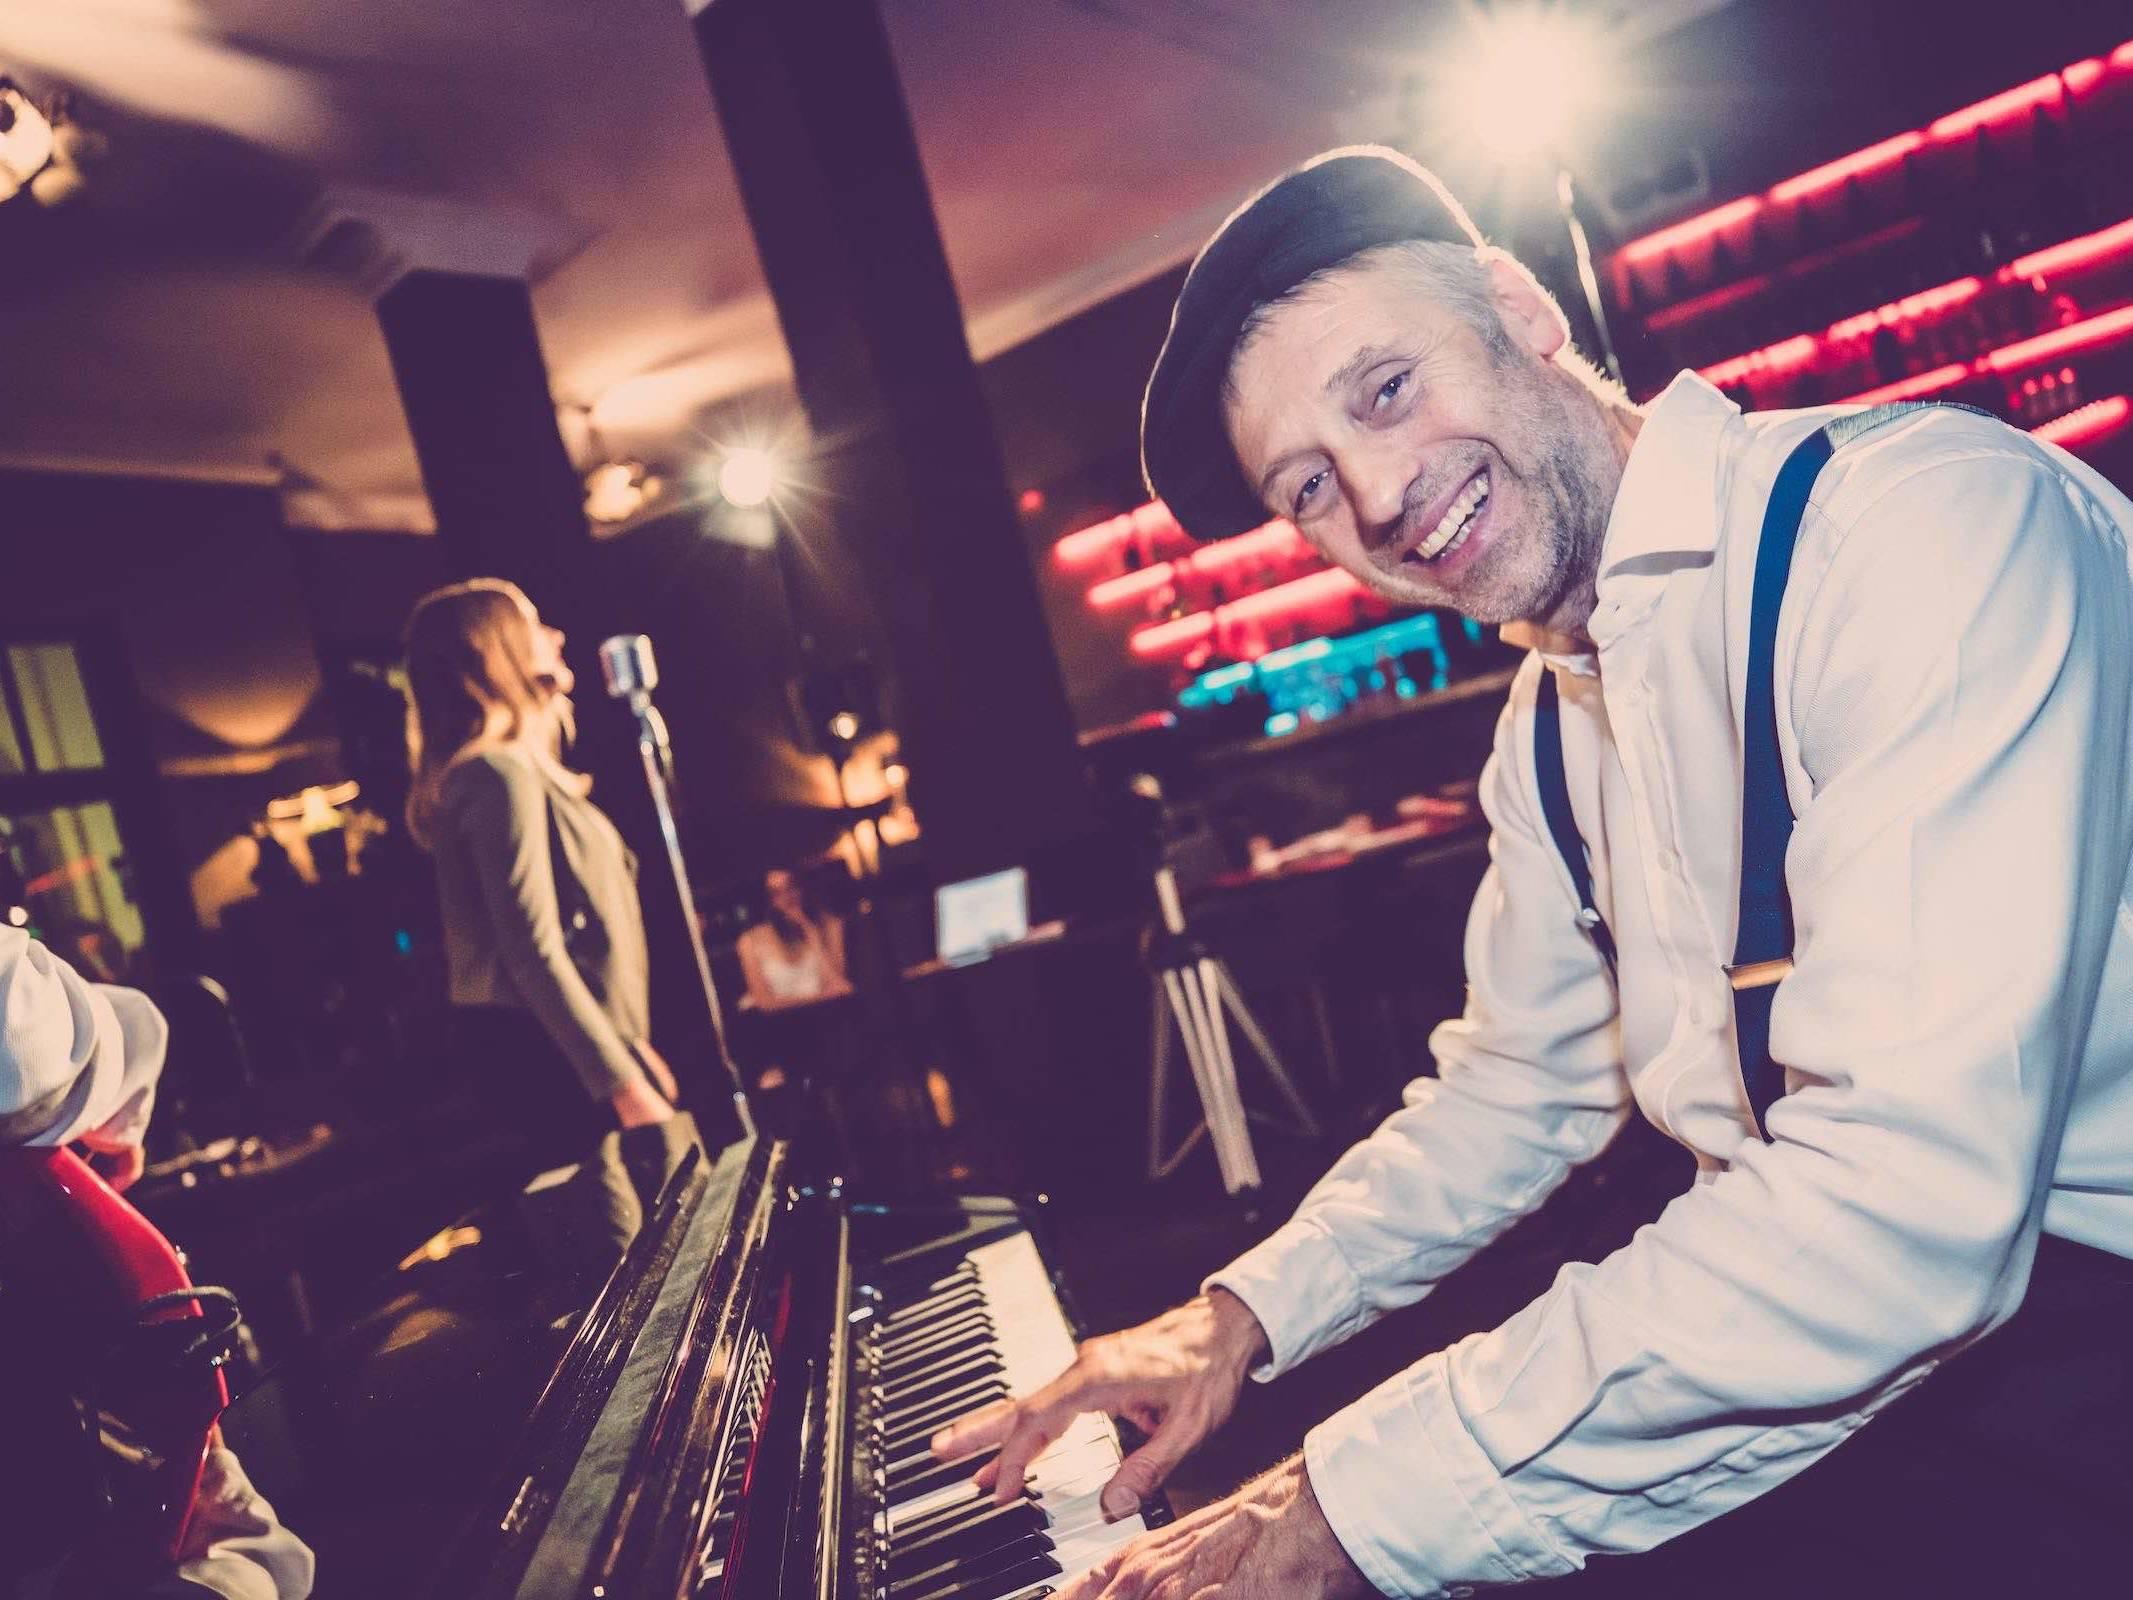 Band | Hamburg | Liveband | Livemusik | Partyband | Jazzband | Swingband | Popband | Jazz | Motown | Soul | Pianist | Klavierspieler | Hochzeit | Messe | Firmenfeier | Charity | Gala | Buchen | Mieten | Anfragen | Hamburgfeiert